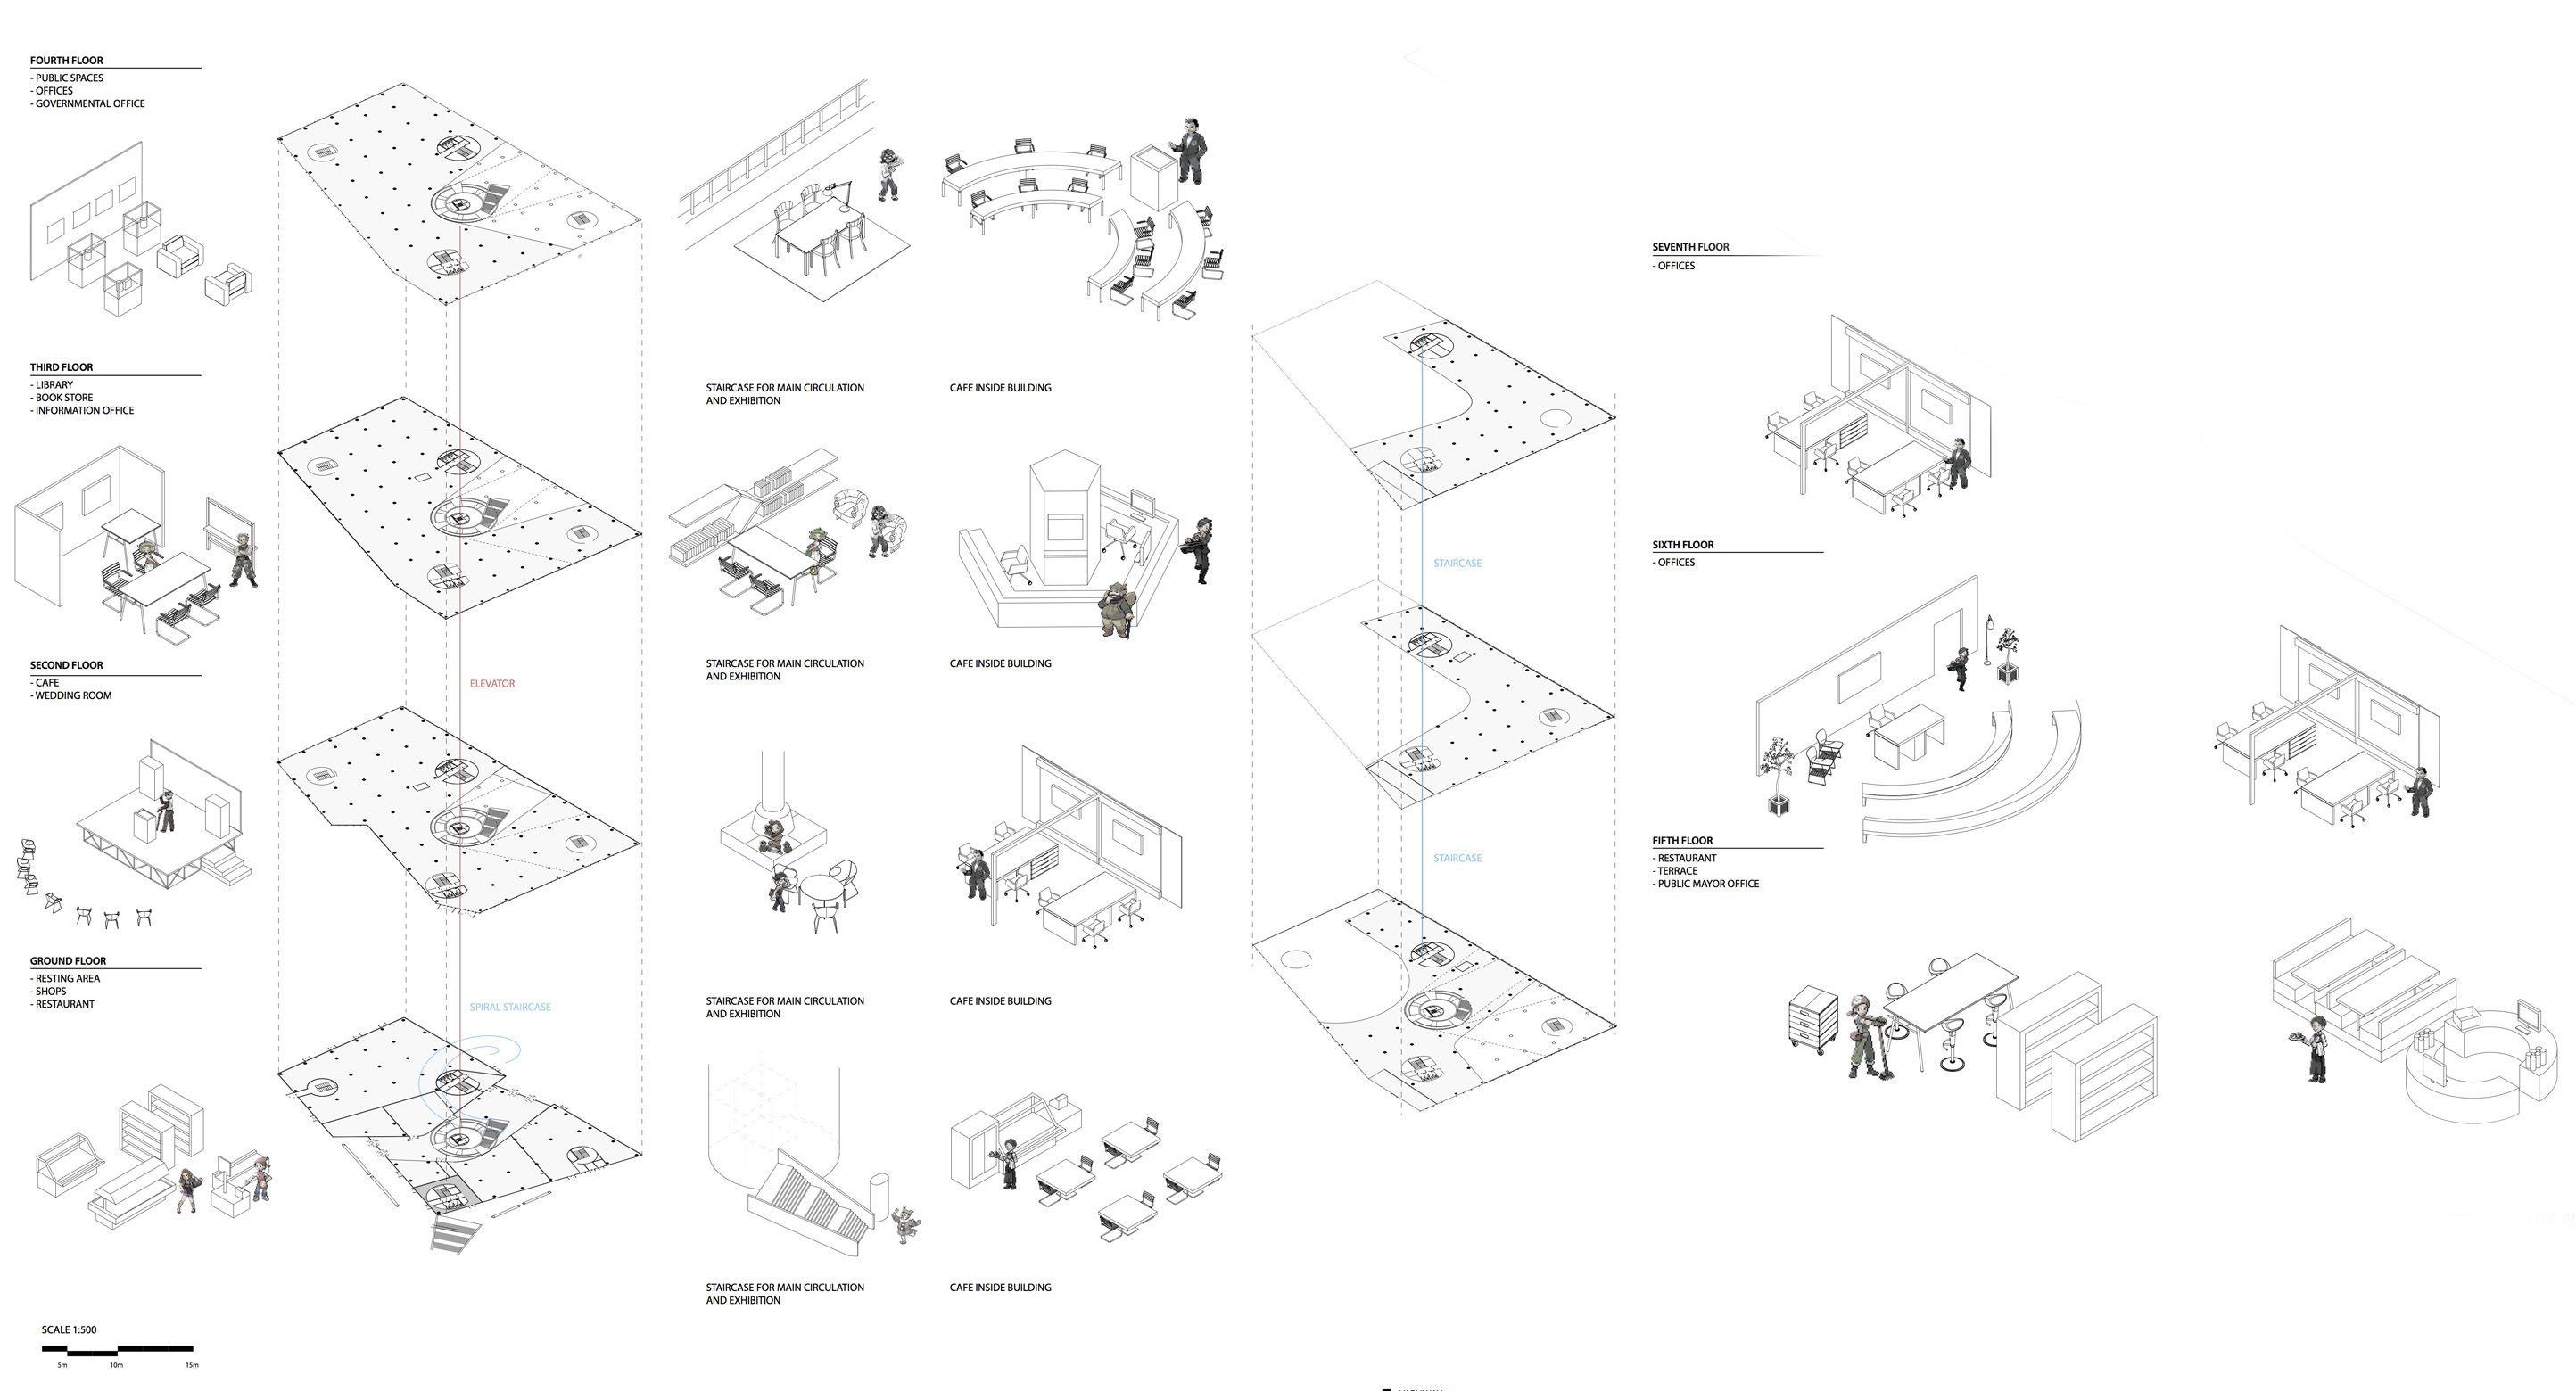 Credit Kannawat Limratepong Floor Plan Activity